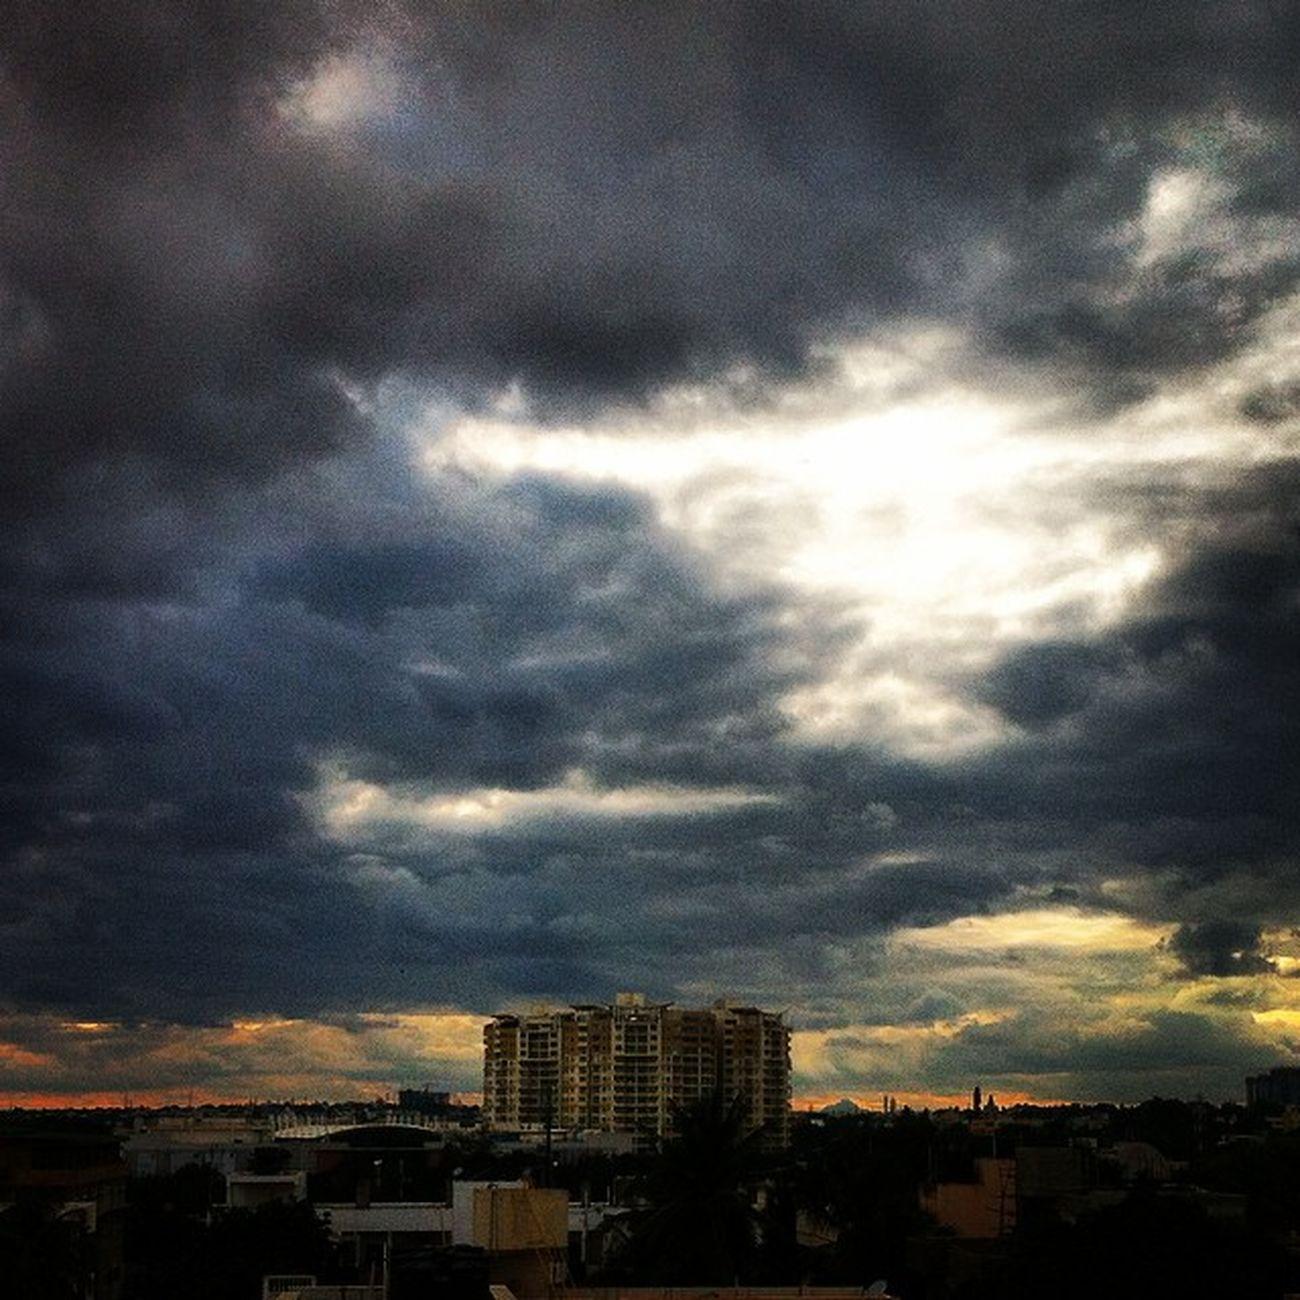 Mantrisquare Bangalore Bangaluru Evening Sunset Ssunshot Sheshadripuram Instaevening Instabangalore Instaphotography Clouds Hostel Outview Namma_karnataka Nammakarnatakamemes Sun IPhone Karnataka India Iphone4 VSCO Vscocam Random Click Share :)